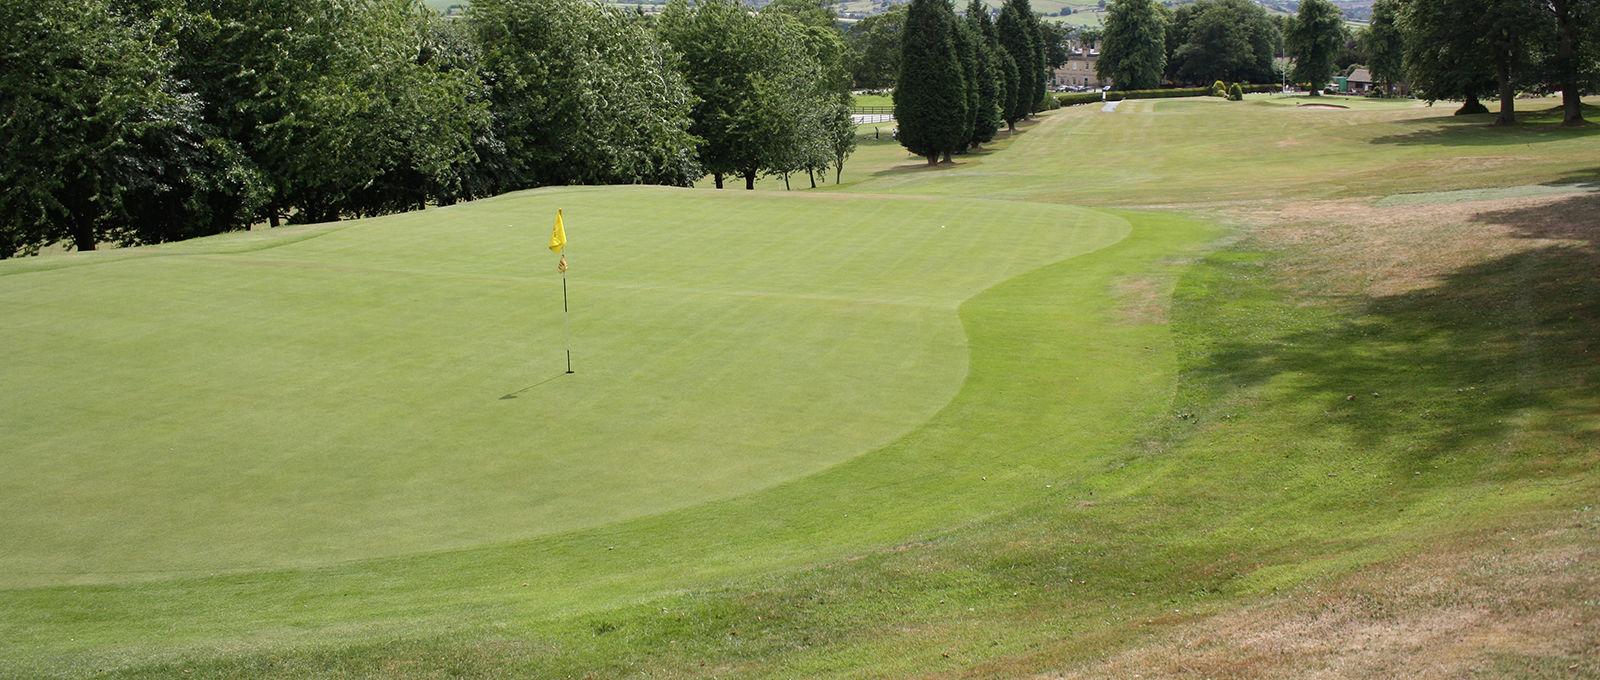 Bingley saint ives golf club ltd cover picture